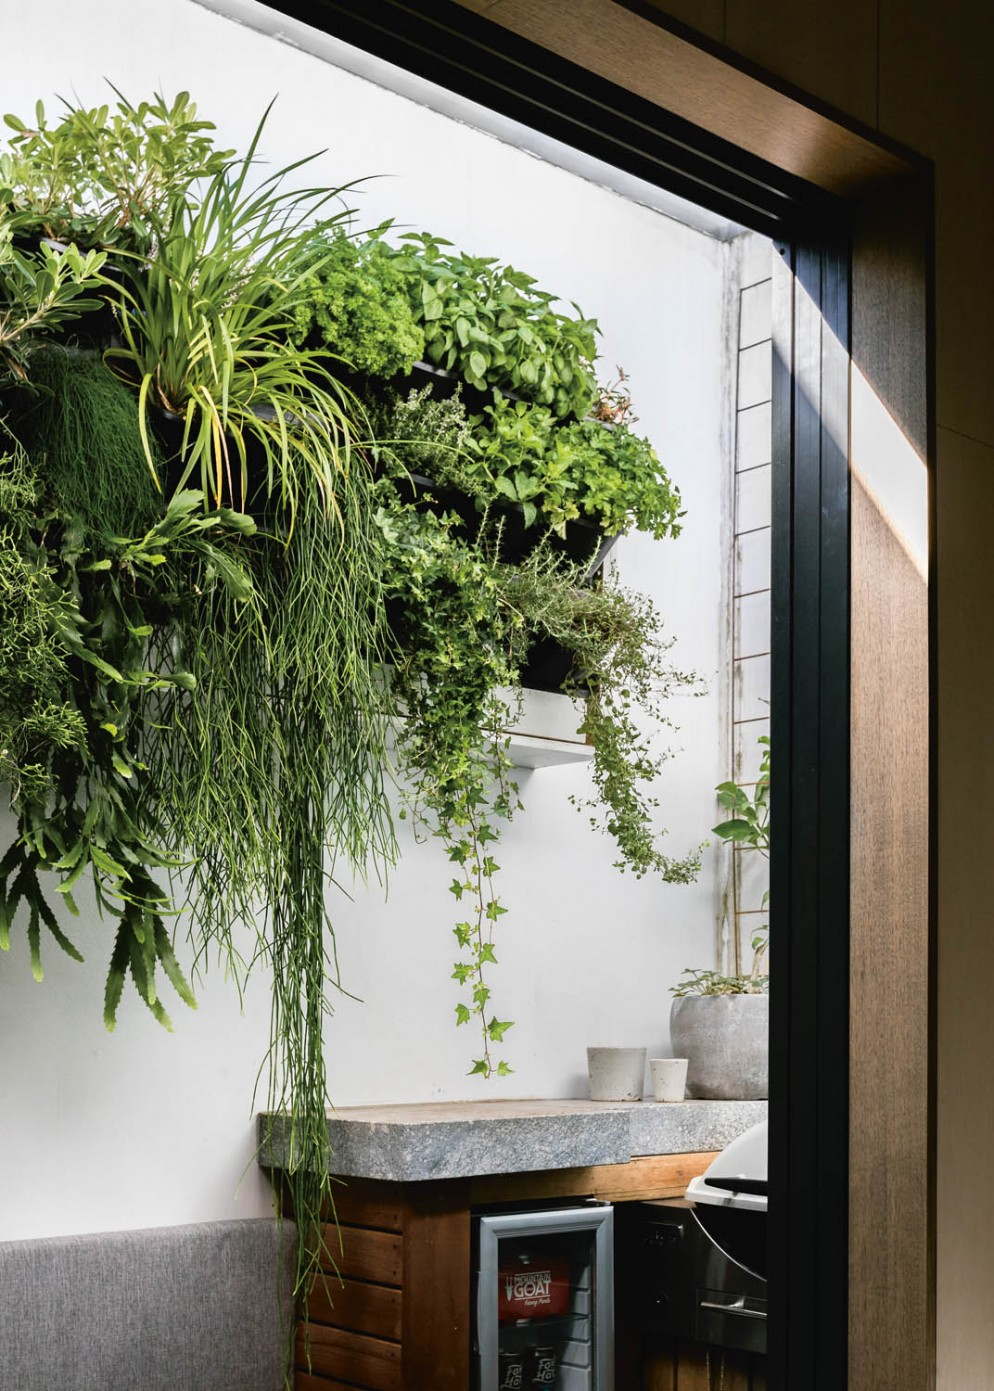 piante-giardini-verde-idee-0120